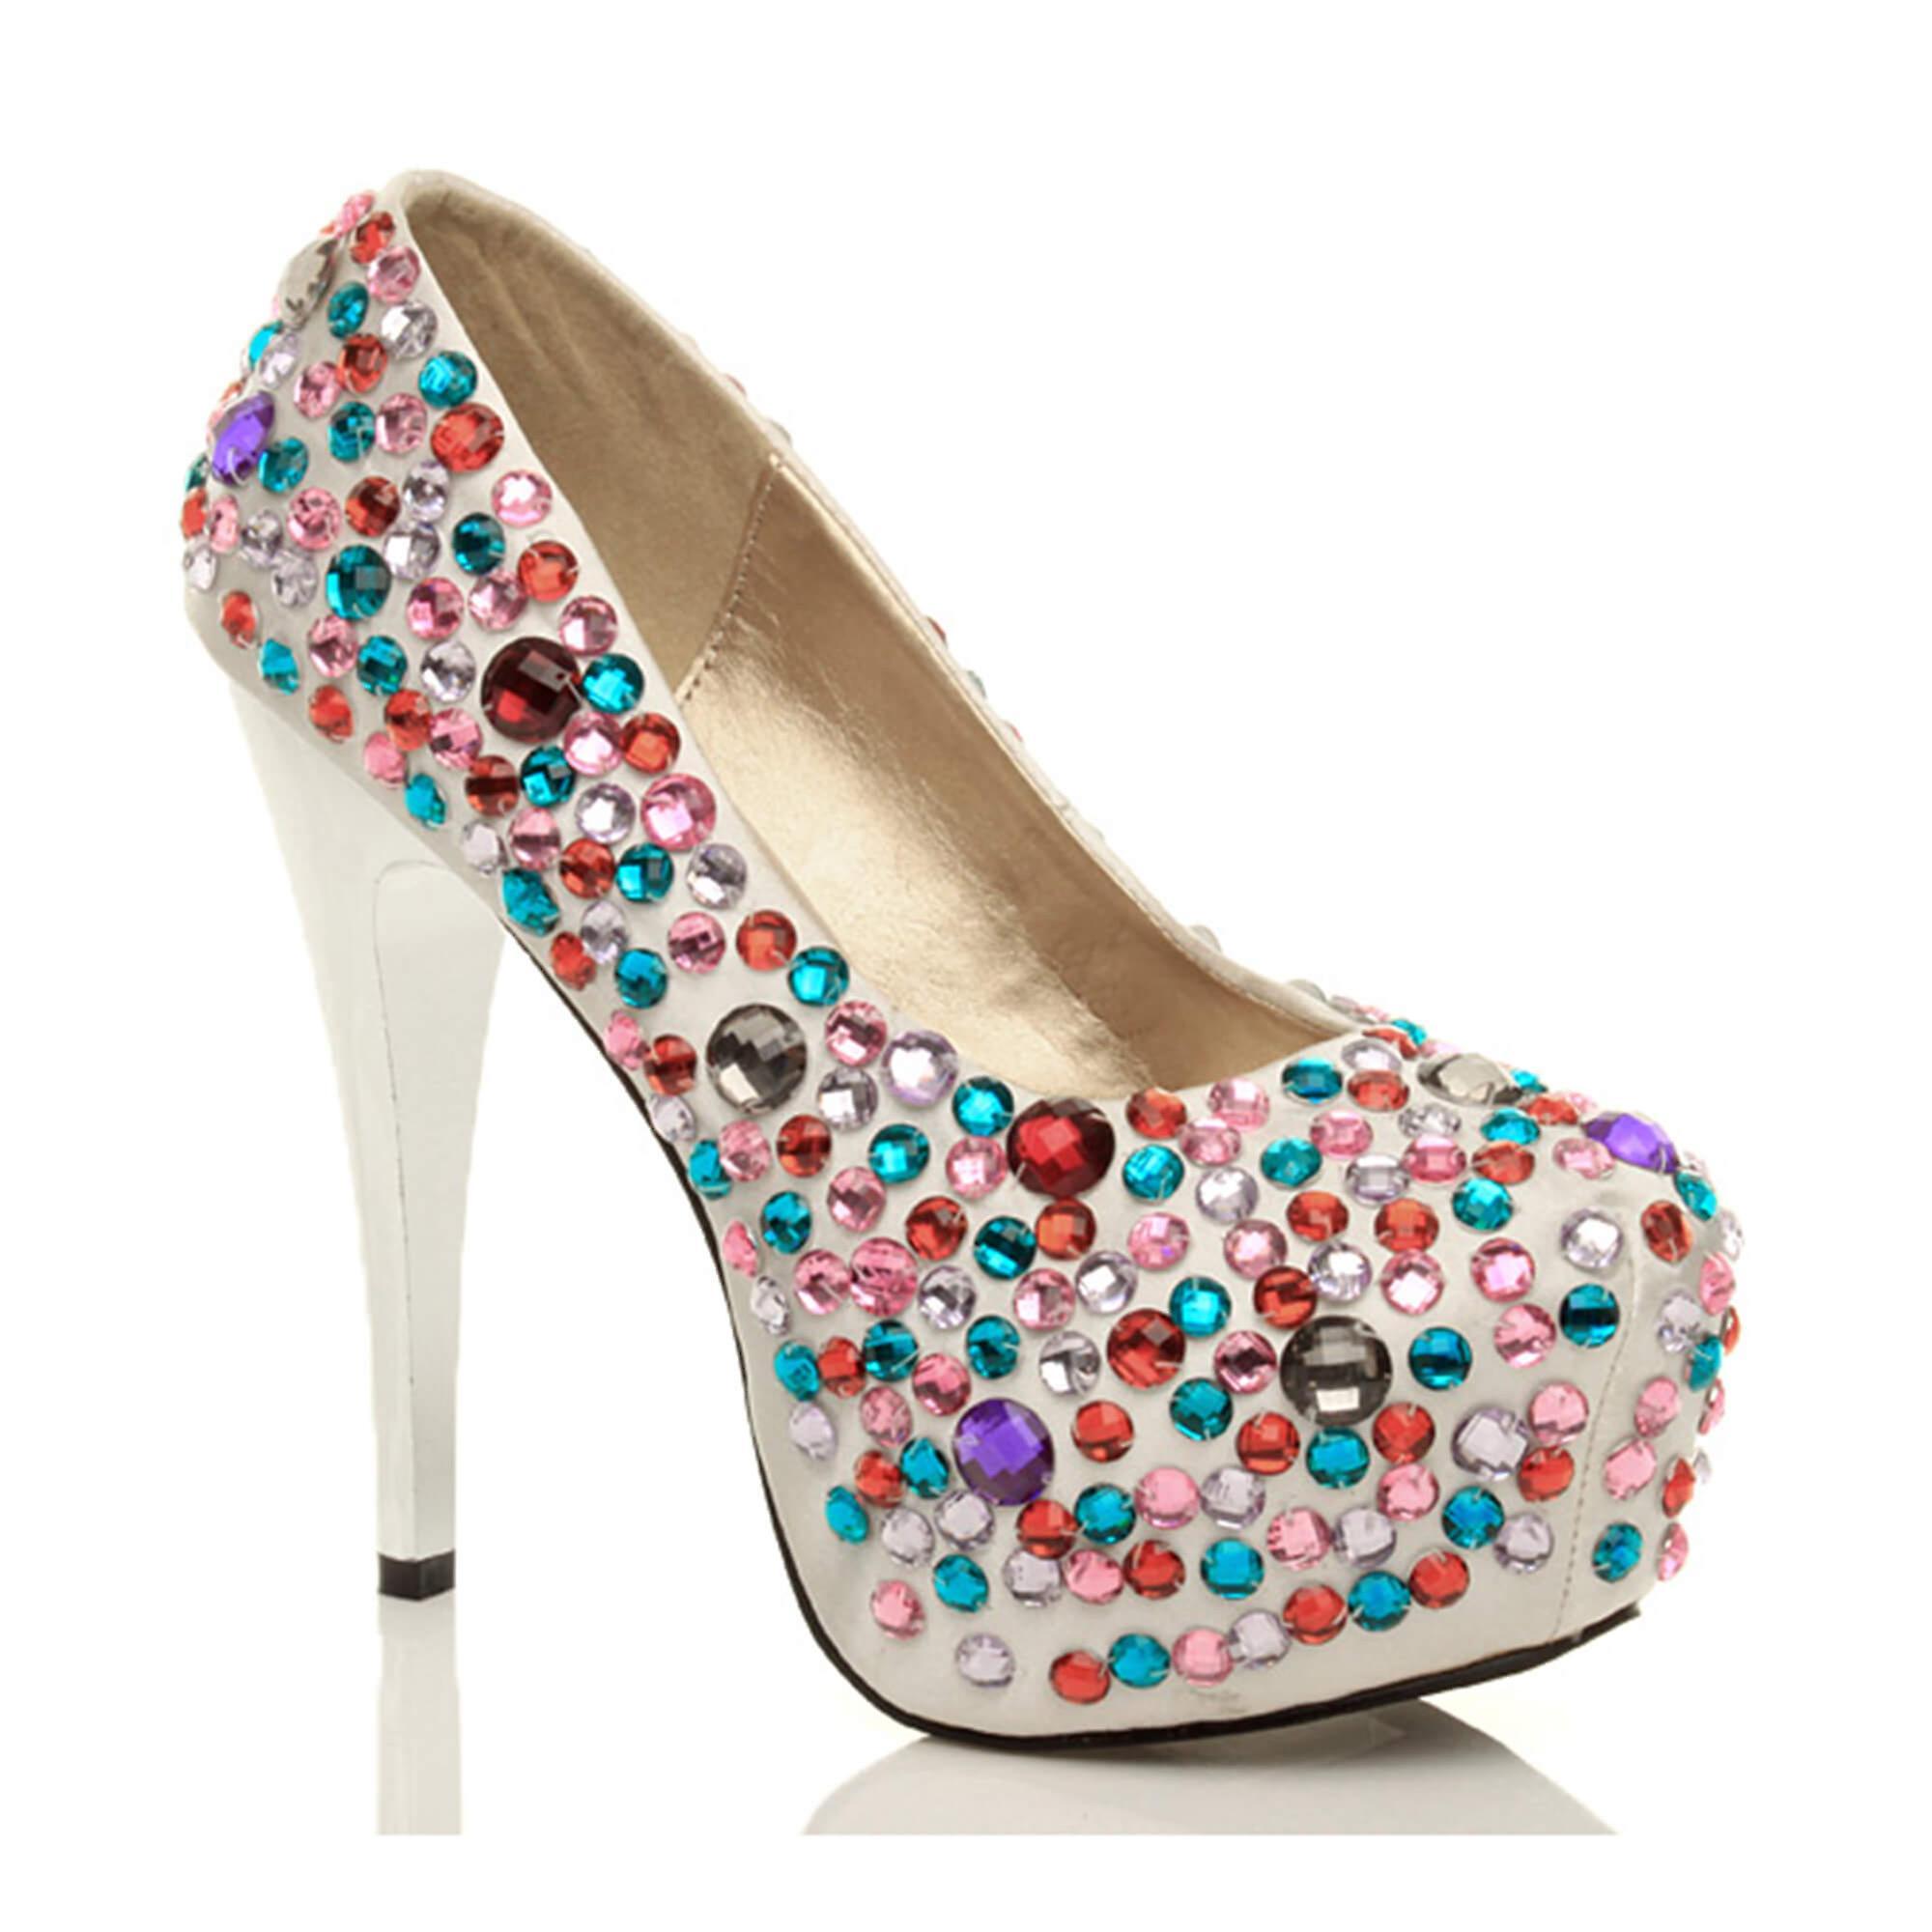 Ajvani womens high heel platform wedding prom party shoes bridal gems diamante court shoes party pumps<Online Shopping<Gentleman/Lady ac57a8